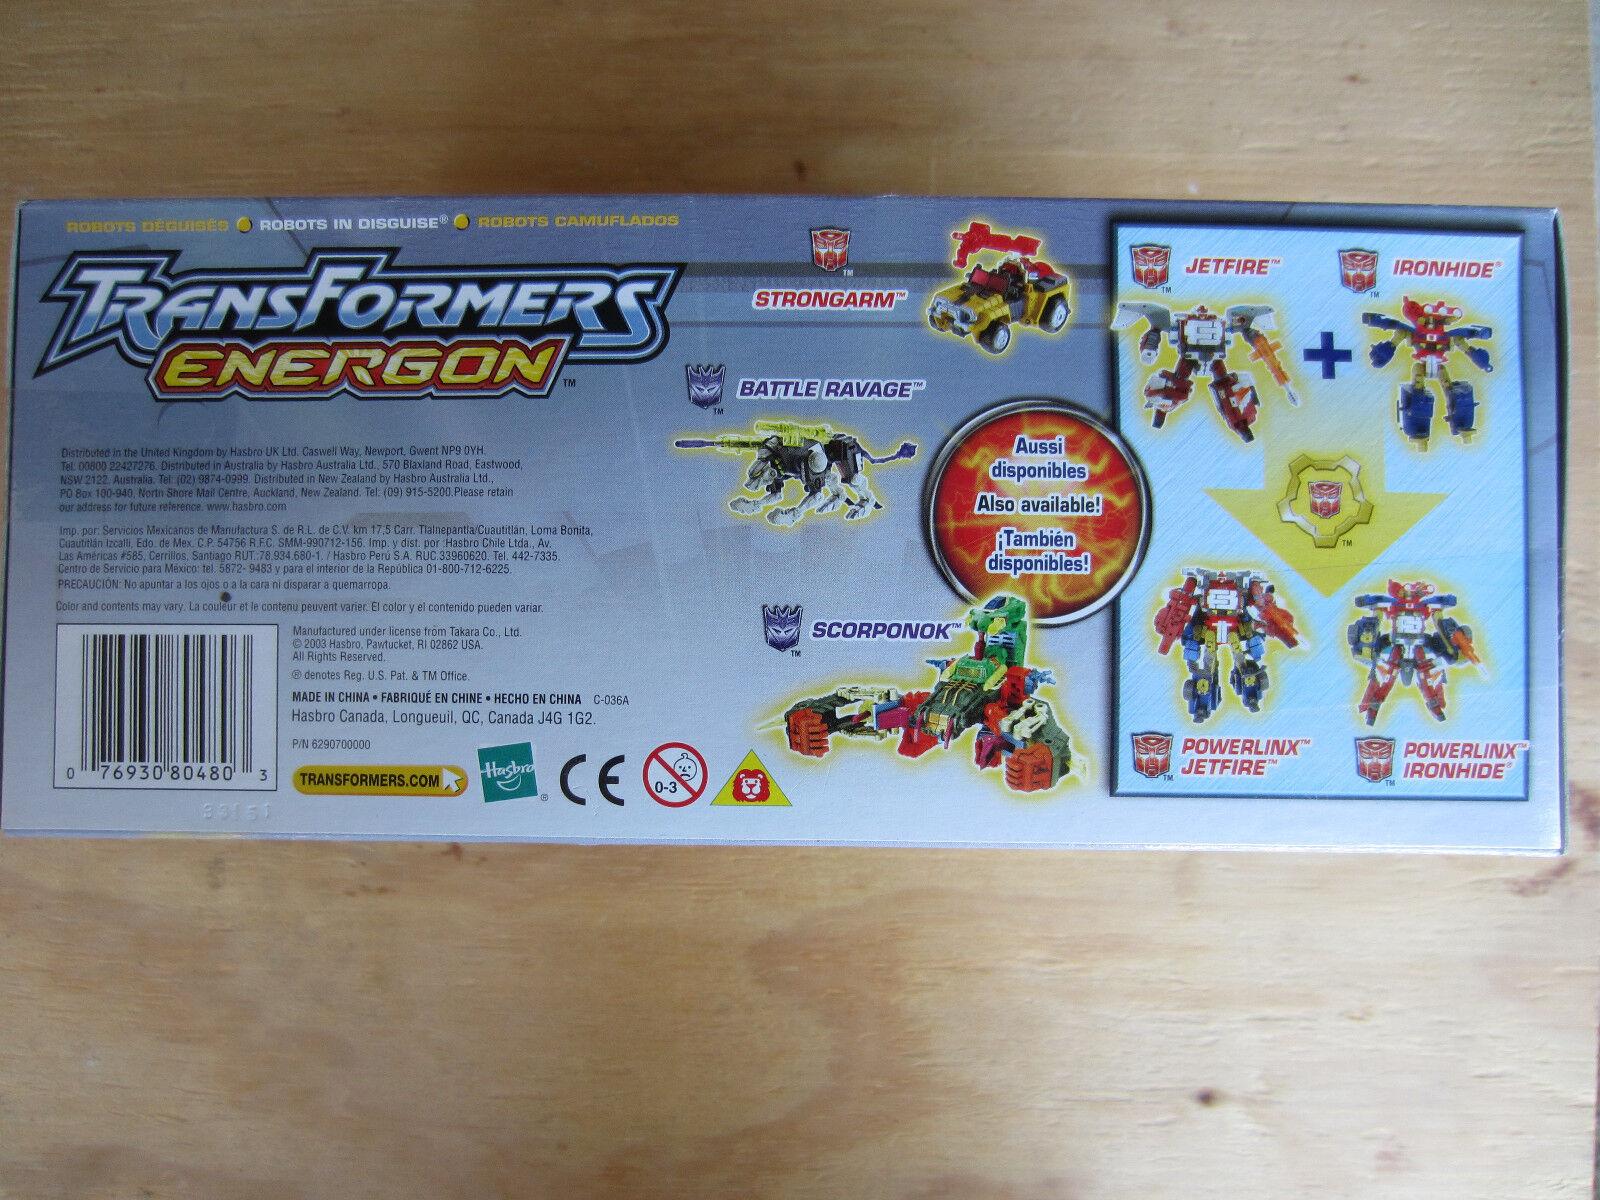 Transformers Voyager Energon Jetfire, Comic Book & Collector Collector Collector Card Included MISB be13c3